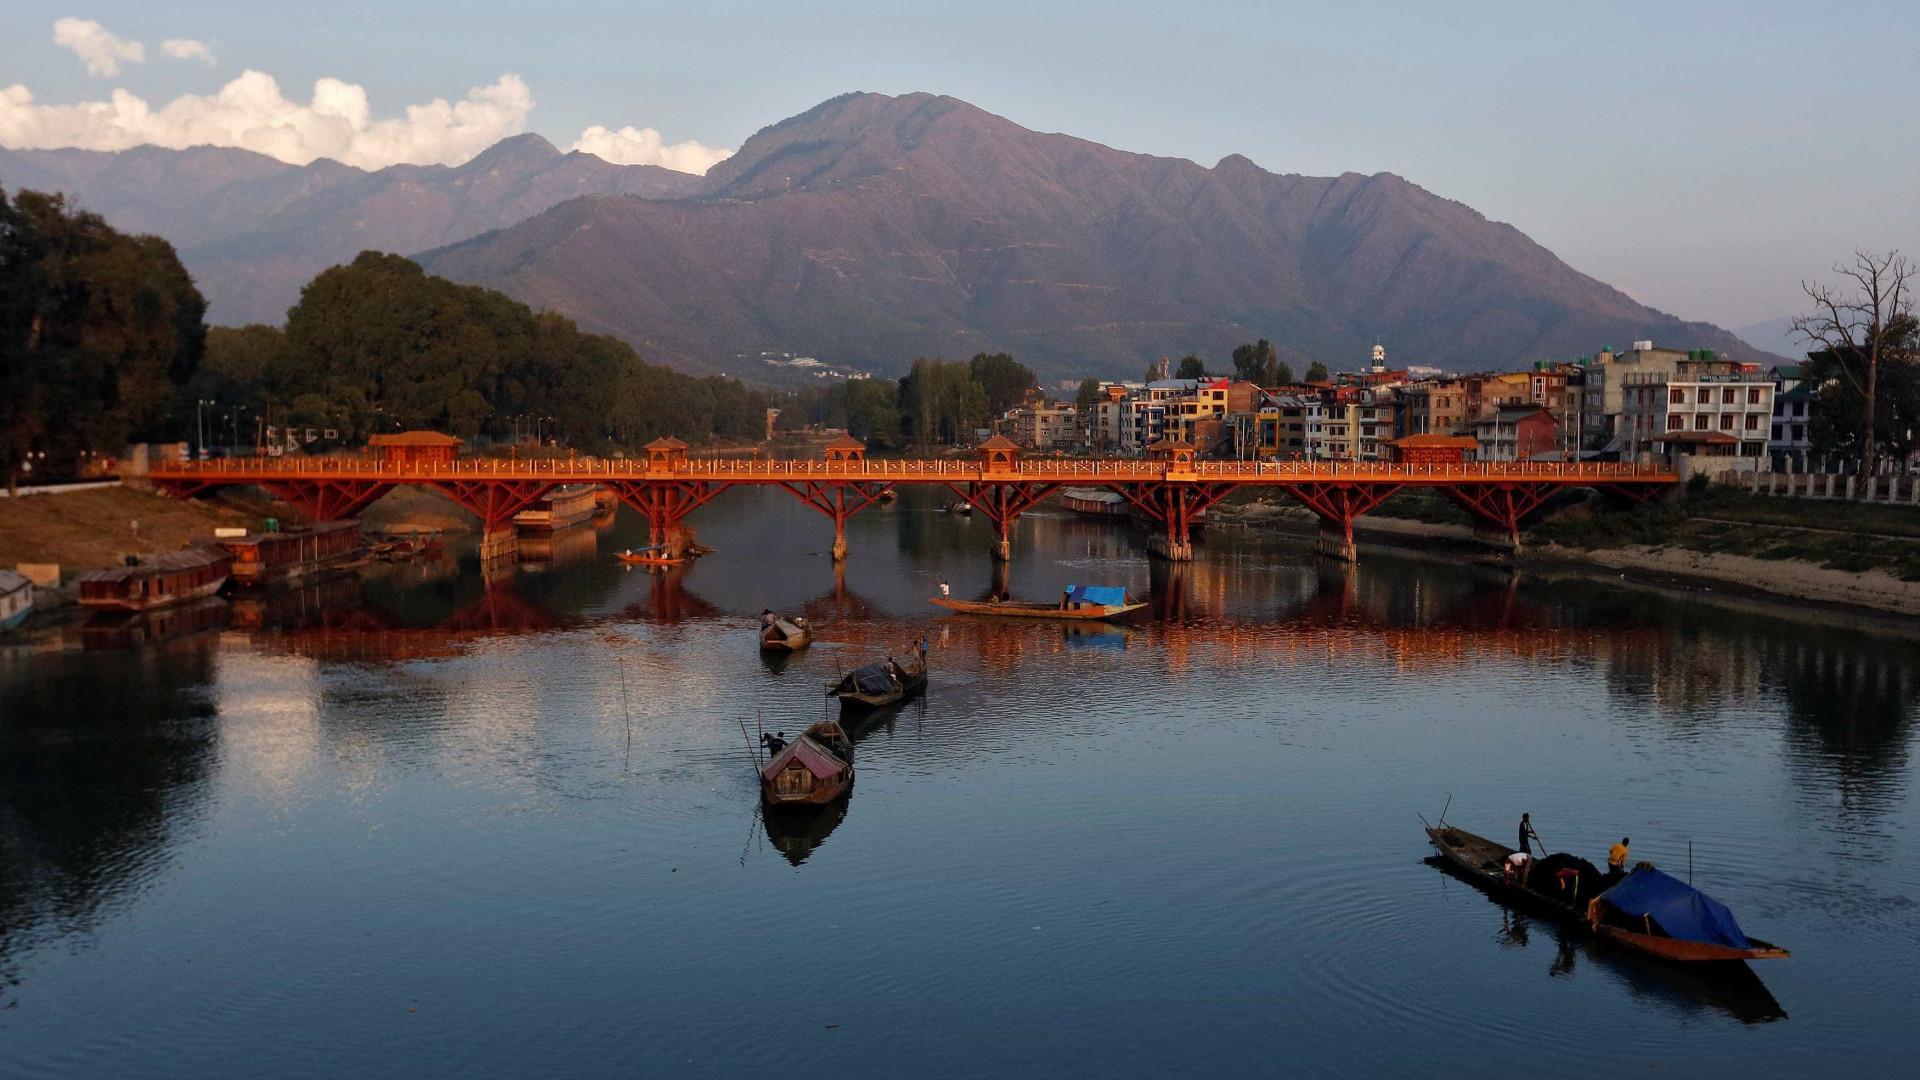 Rio mais extenso do mundo será construído na Índia